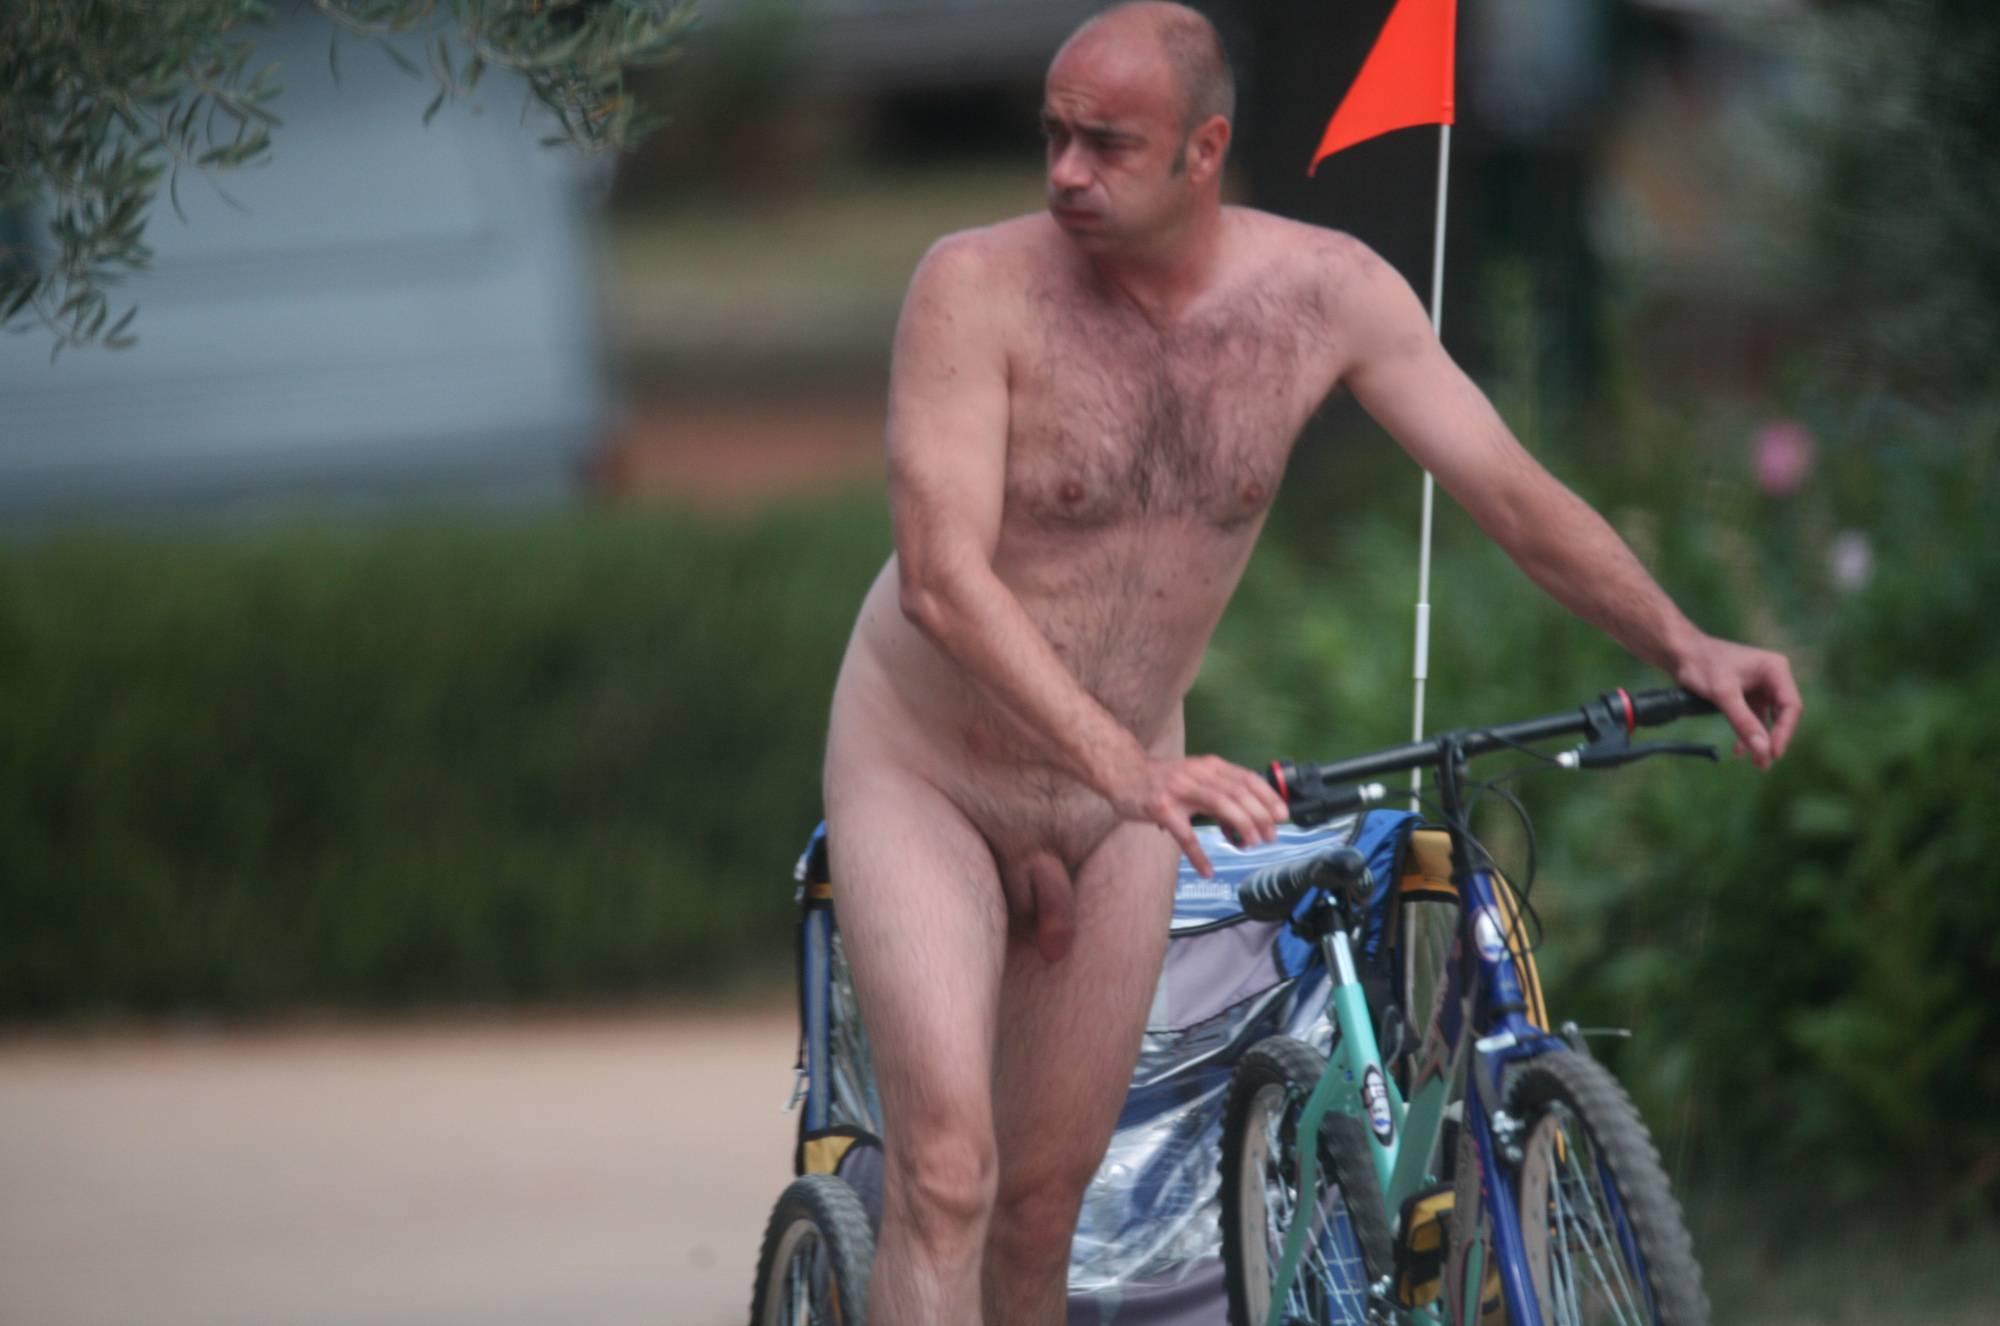 Purenudism Gallery Nude Club Outdoor Biking - 2